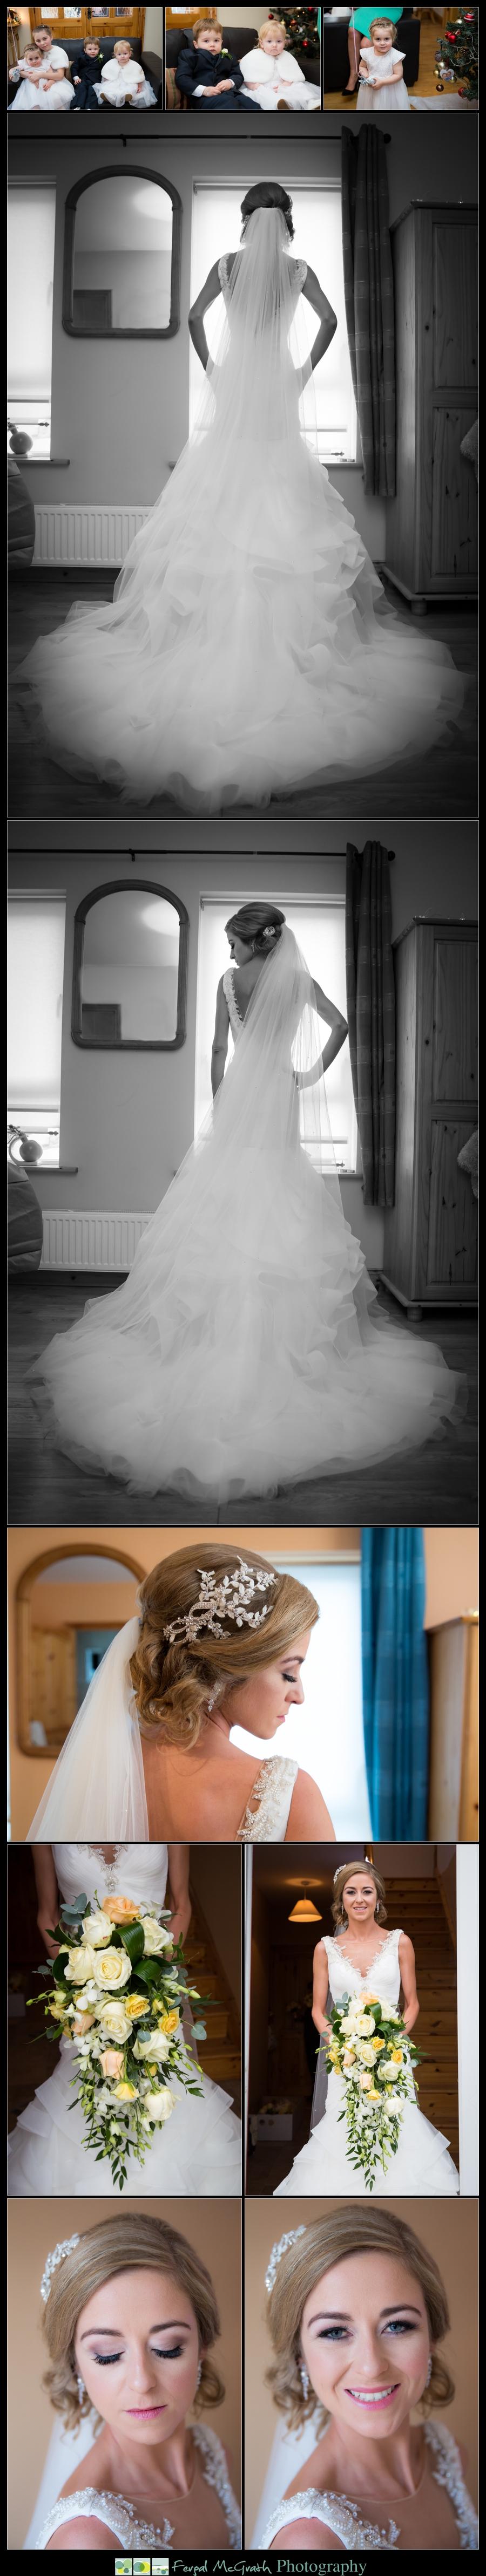 Silver Tassie Hotel Christmas Wedding brides stunning wedding dress photos